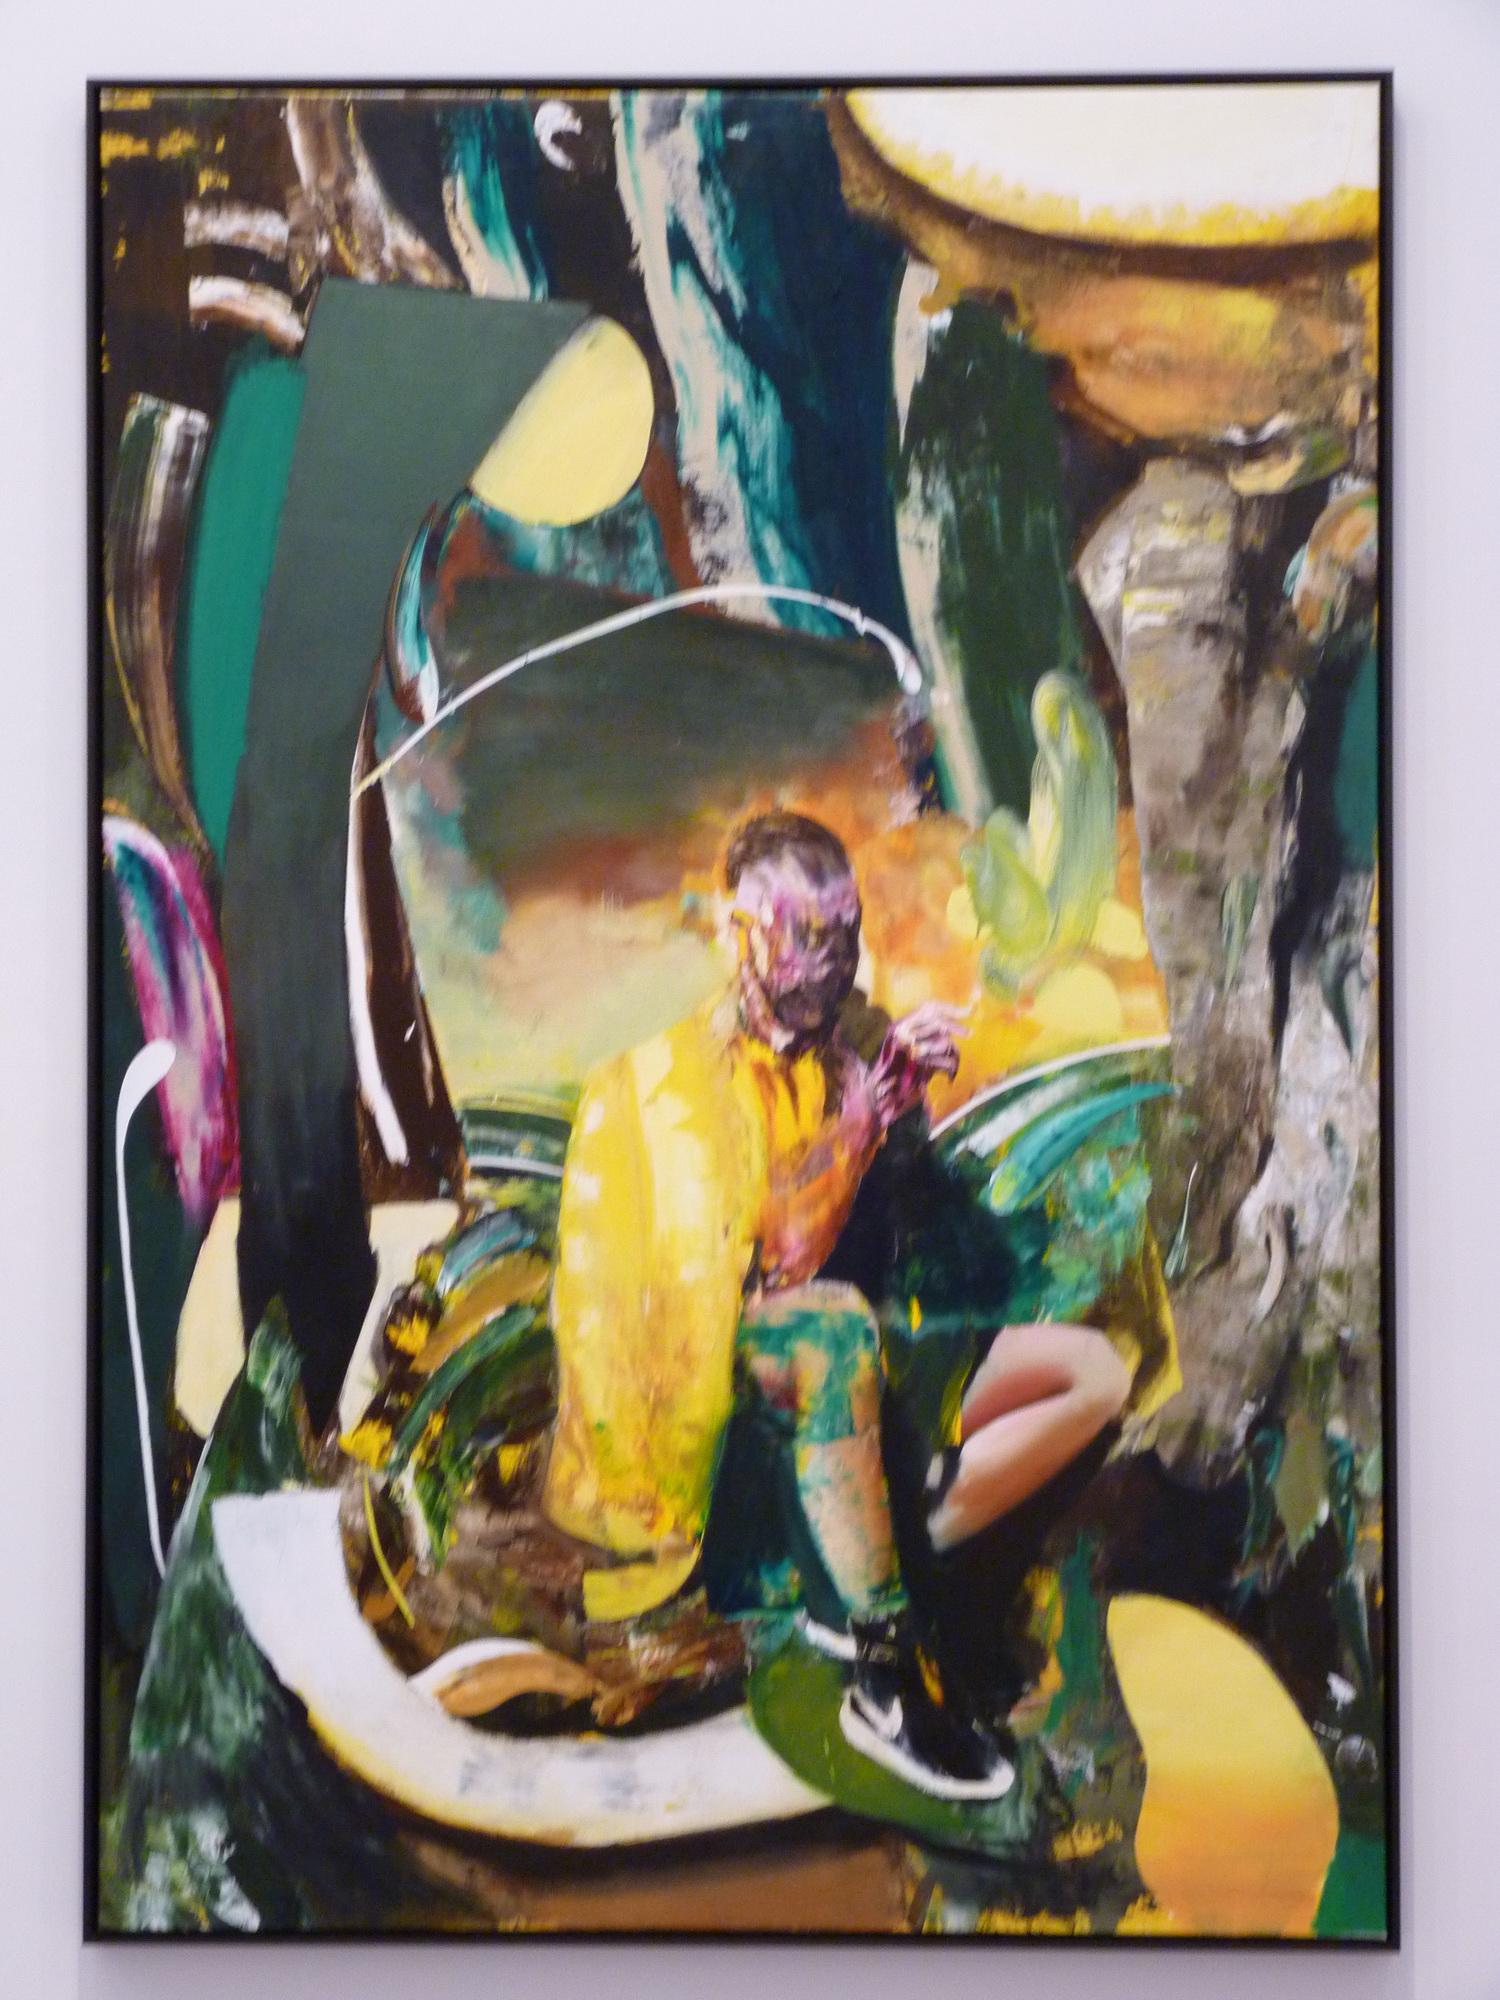 019-7 Adrian Ghenie  ne1977  self-portrait  230x160cm 2015 huile sur toile